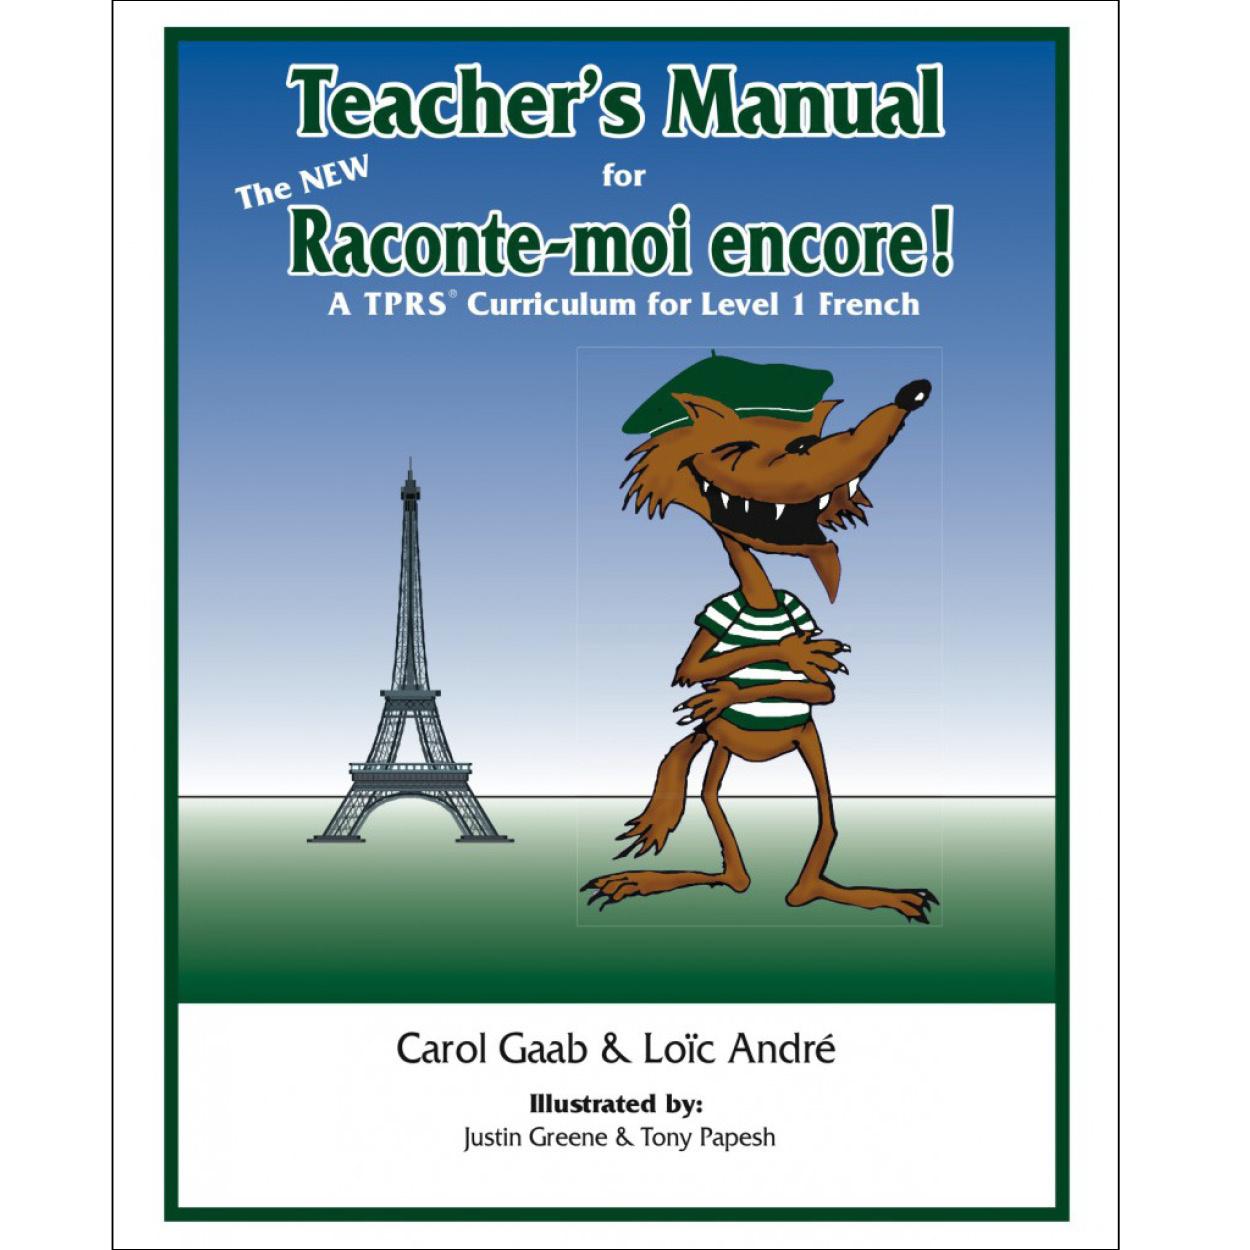 Teacher's Manual for The NEW Raconte-moi encore!